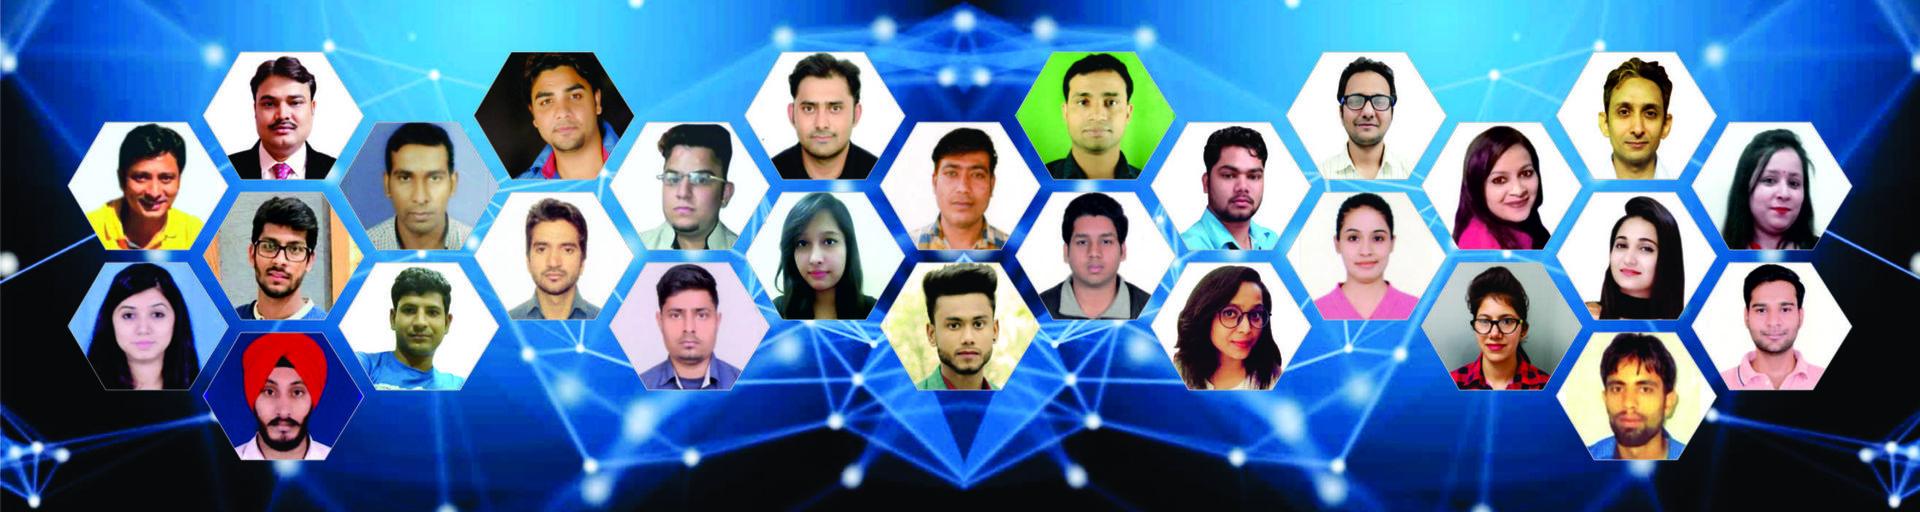 Training Basket IT Training Cources In Noida | Training Basket Institute